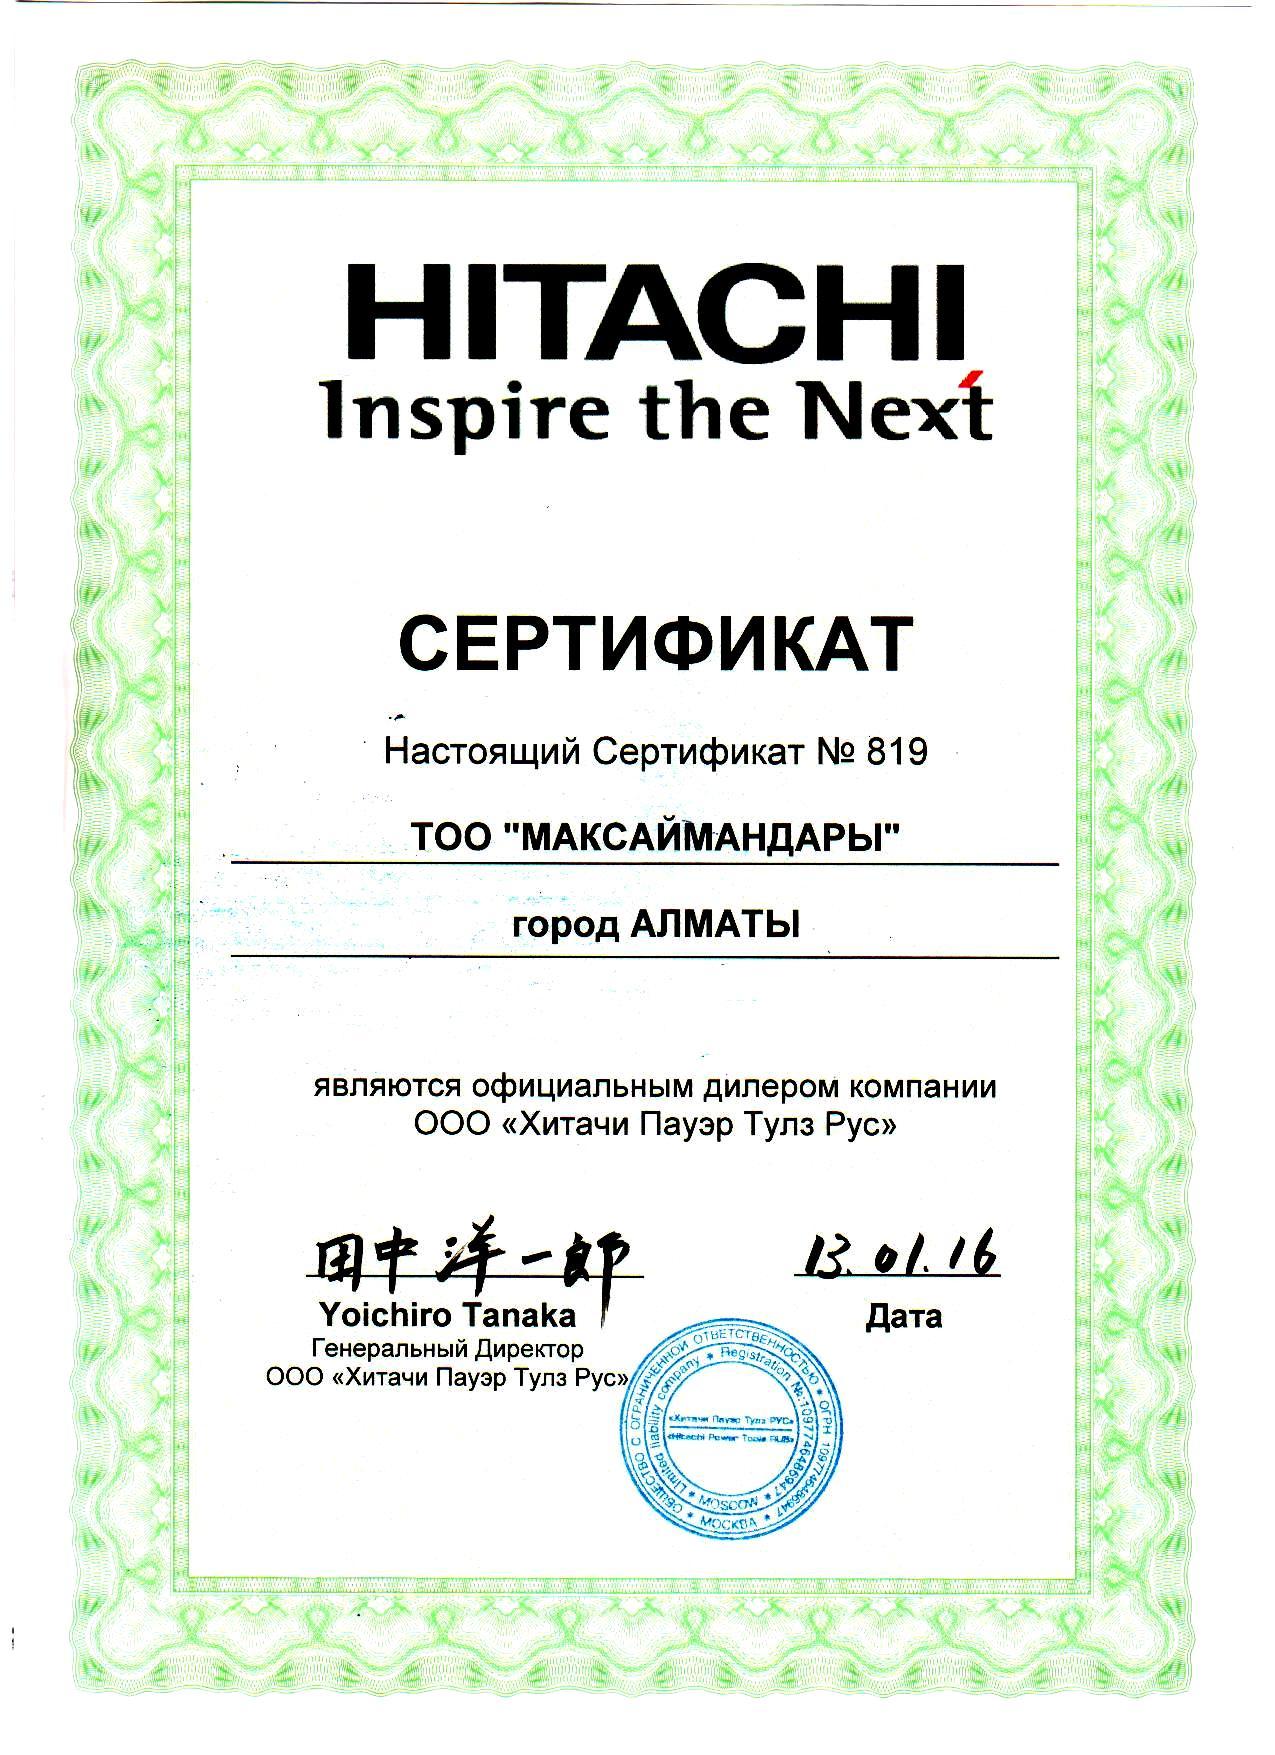 сертификат-hitachi-2016.jpg